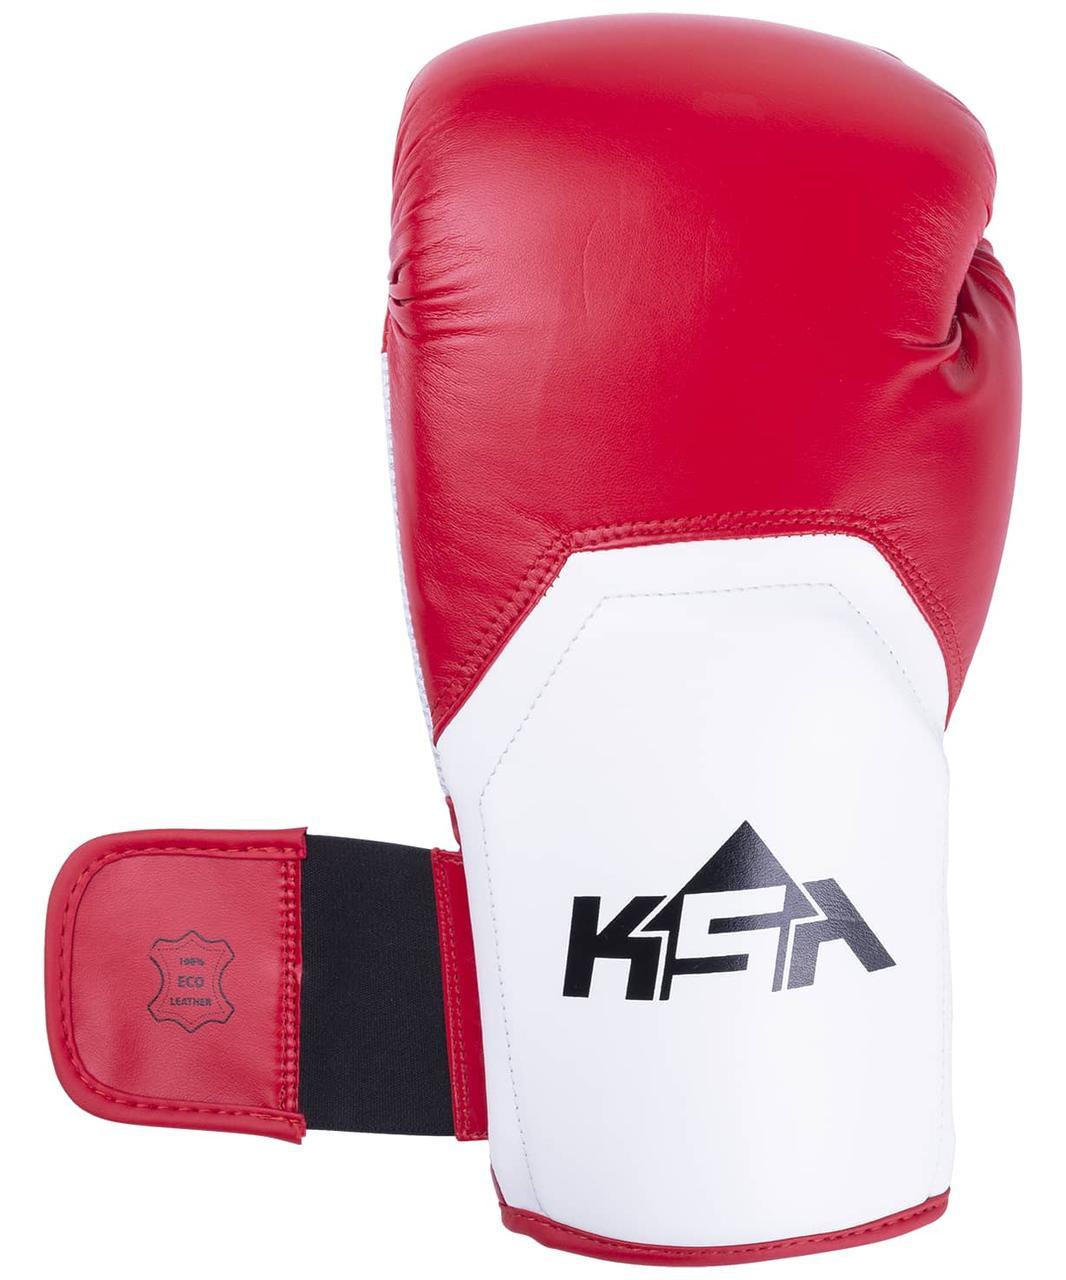 Перчатки боксерские Scorpio Red, к/з, 10 oz KSA